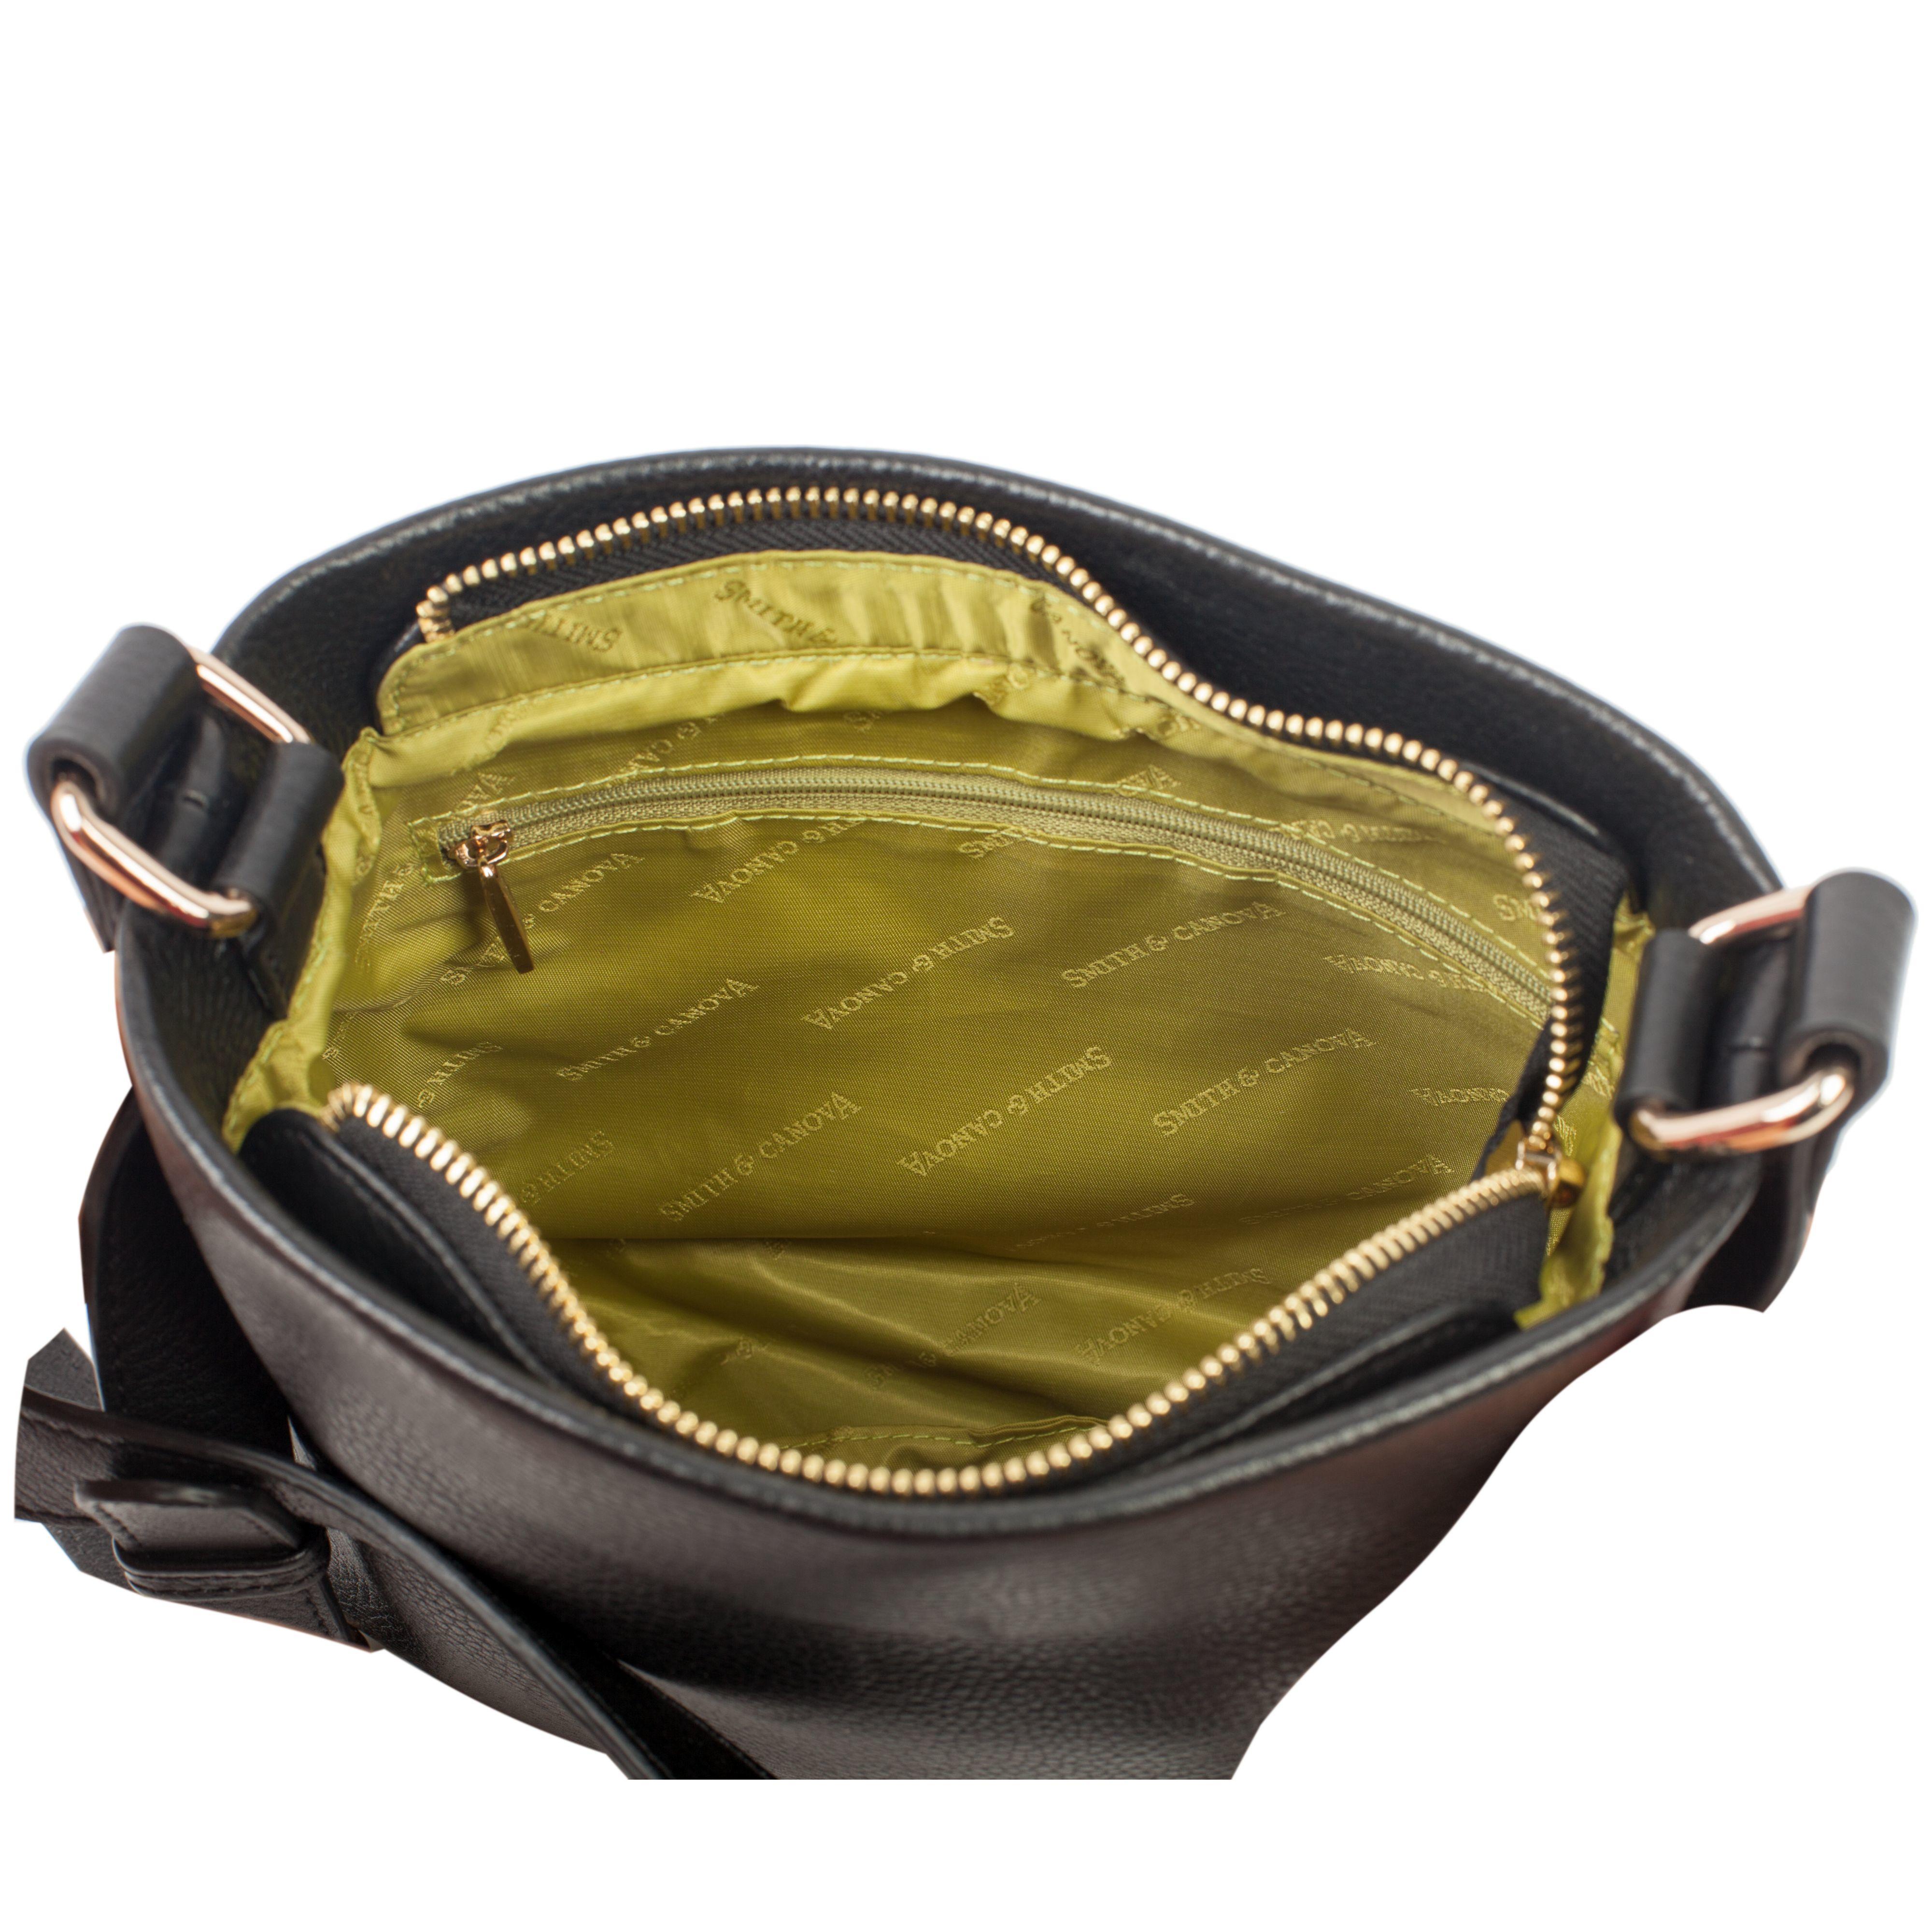 Smith   Canova Zip Top Cross Body Bag in Black - Lyst 1a6749b4b246e